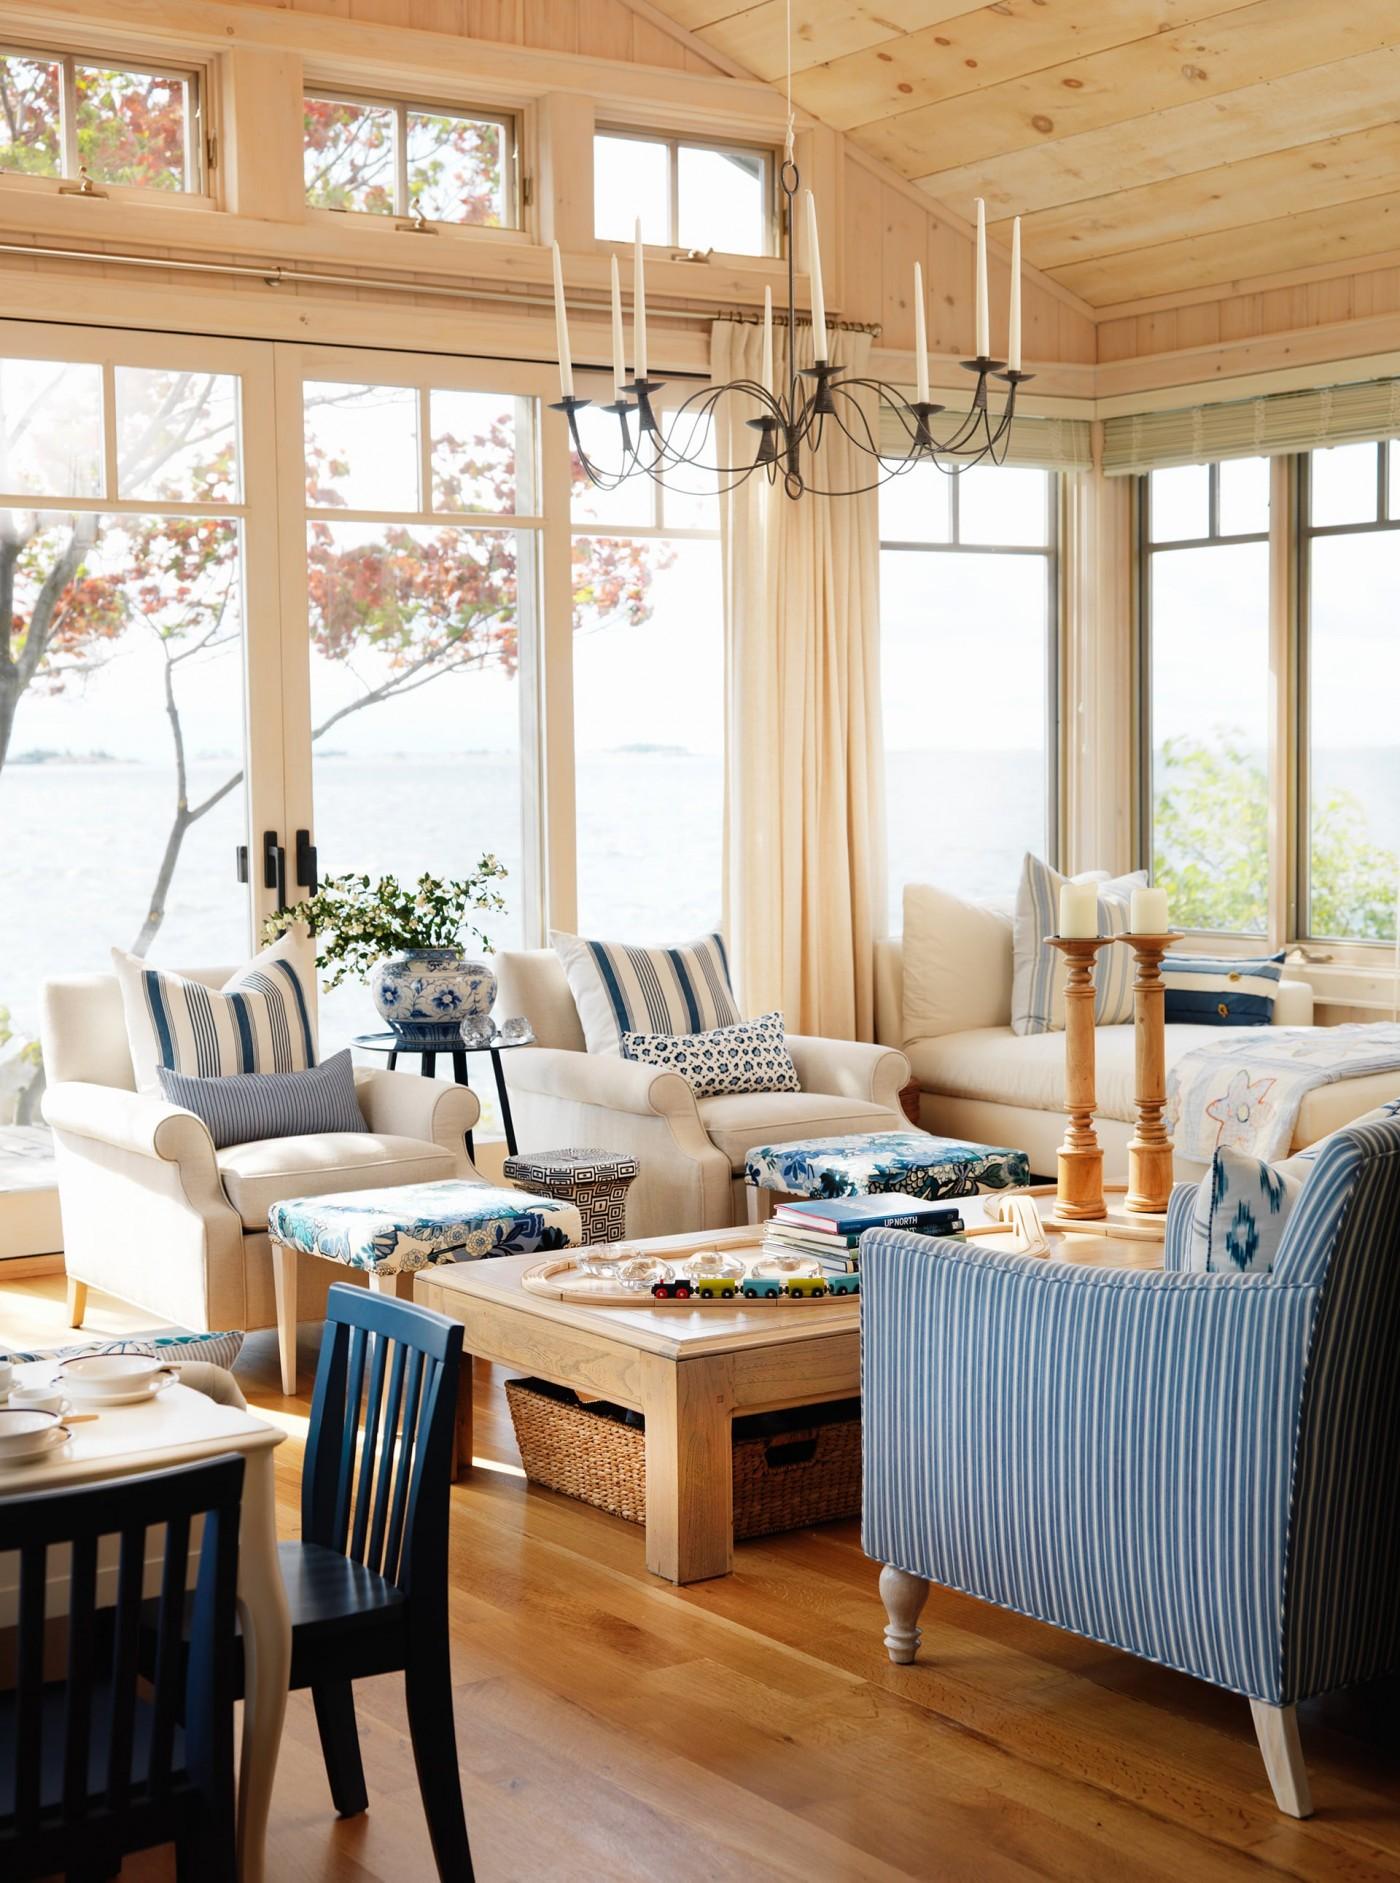 Blue seating area against large windows overlooking water - Sarah Richardson